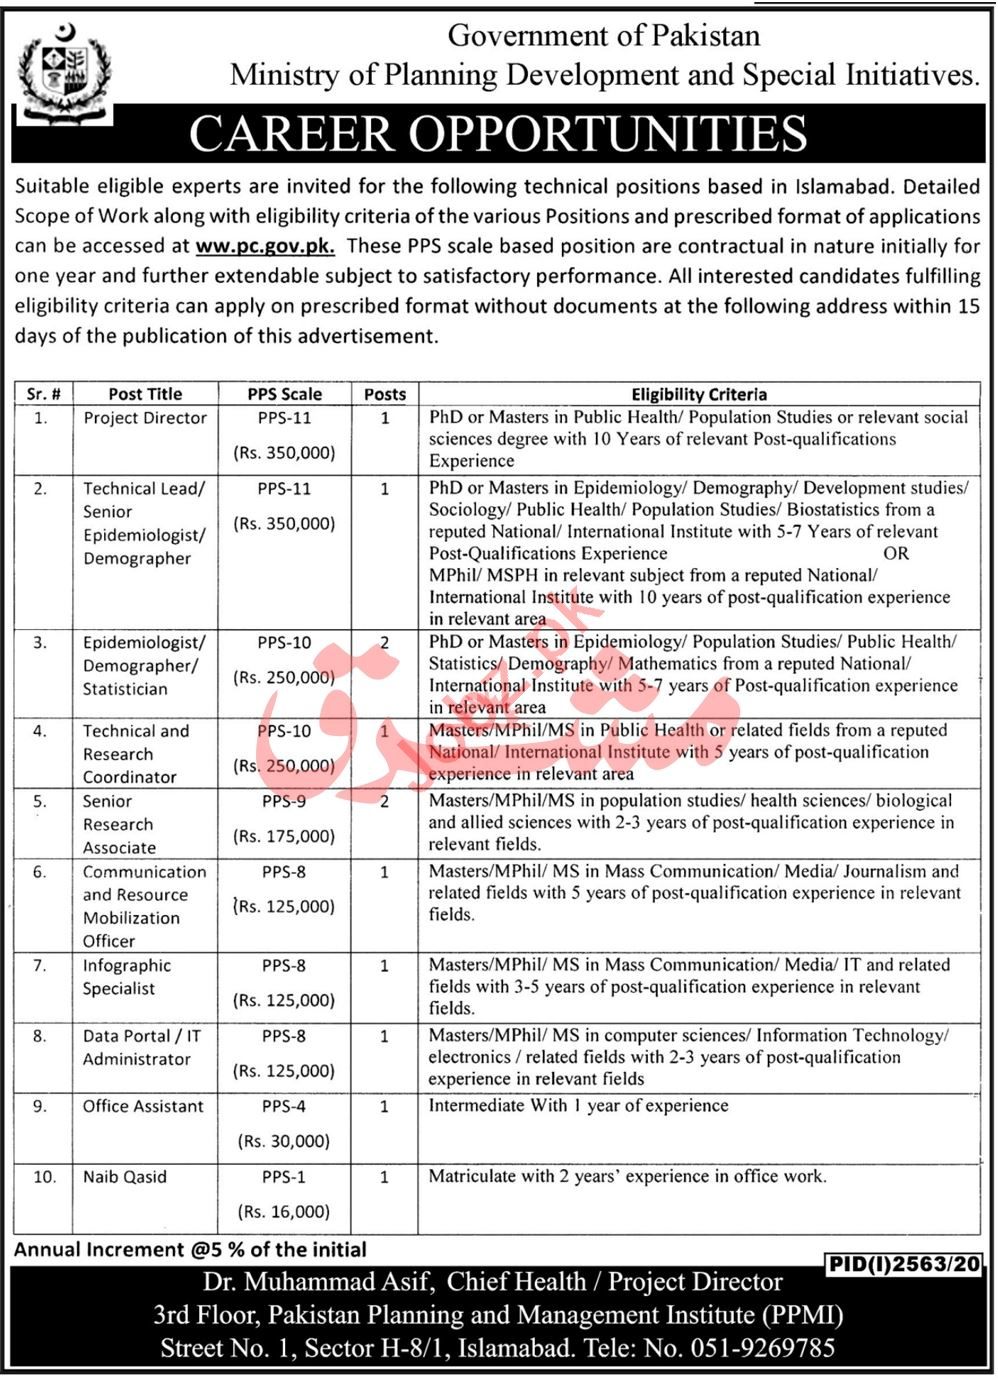 Pakistan Planning & Management Institute PPMI Islamabad Jobs